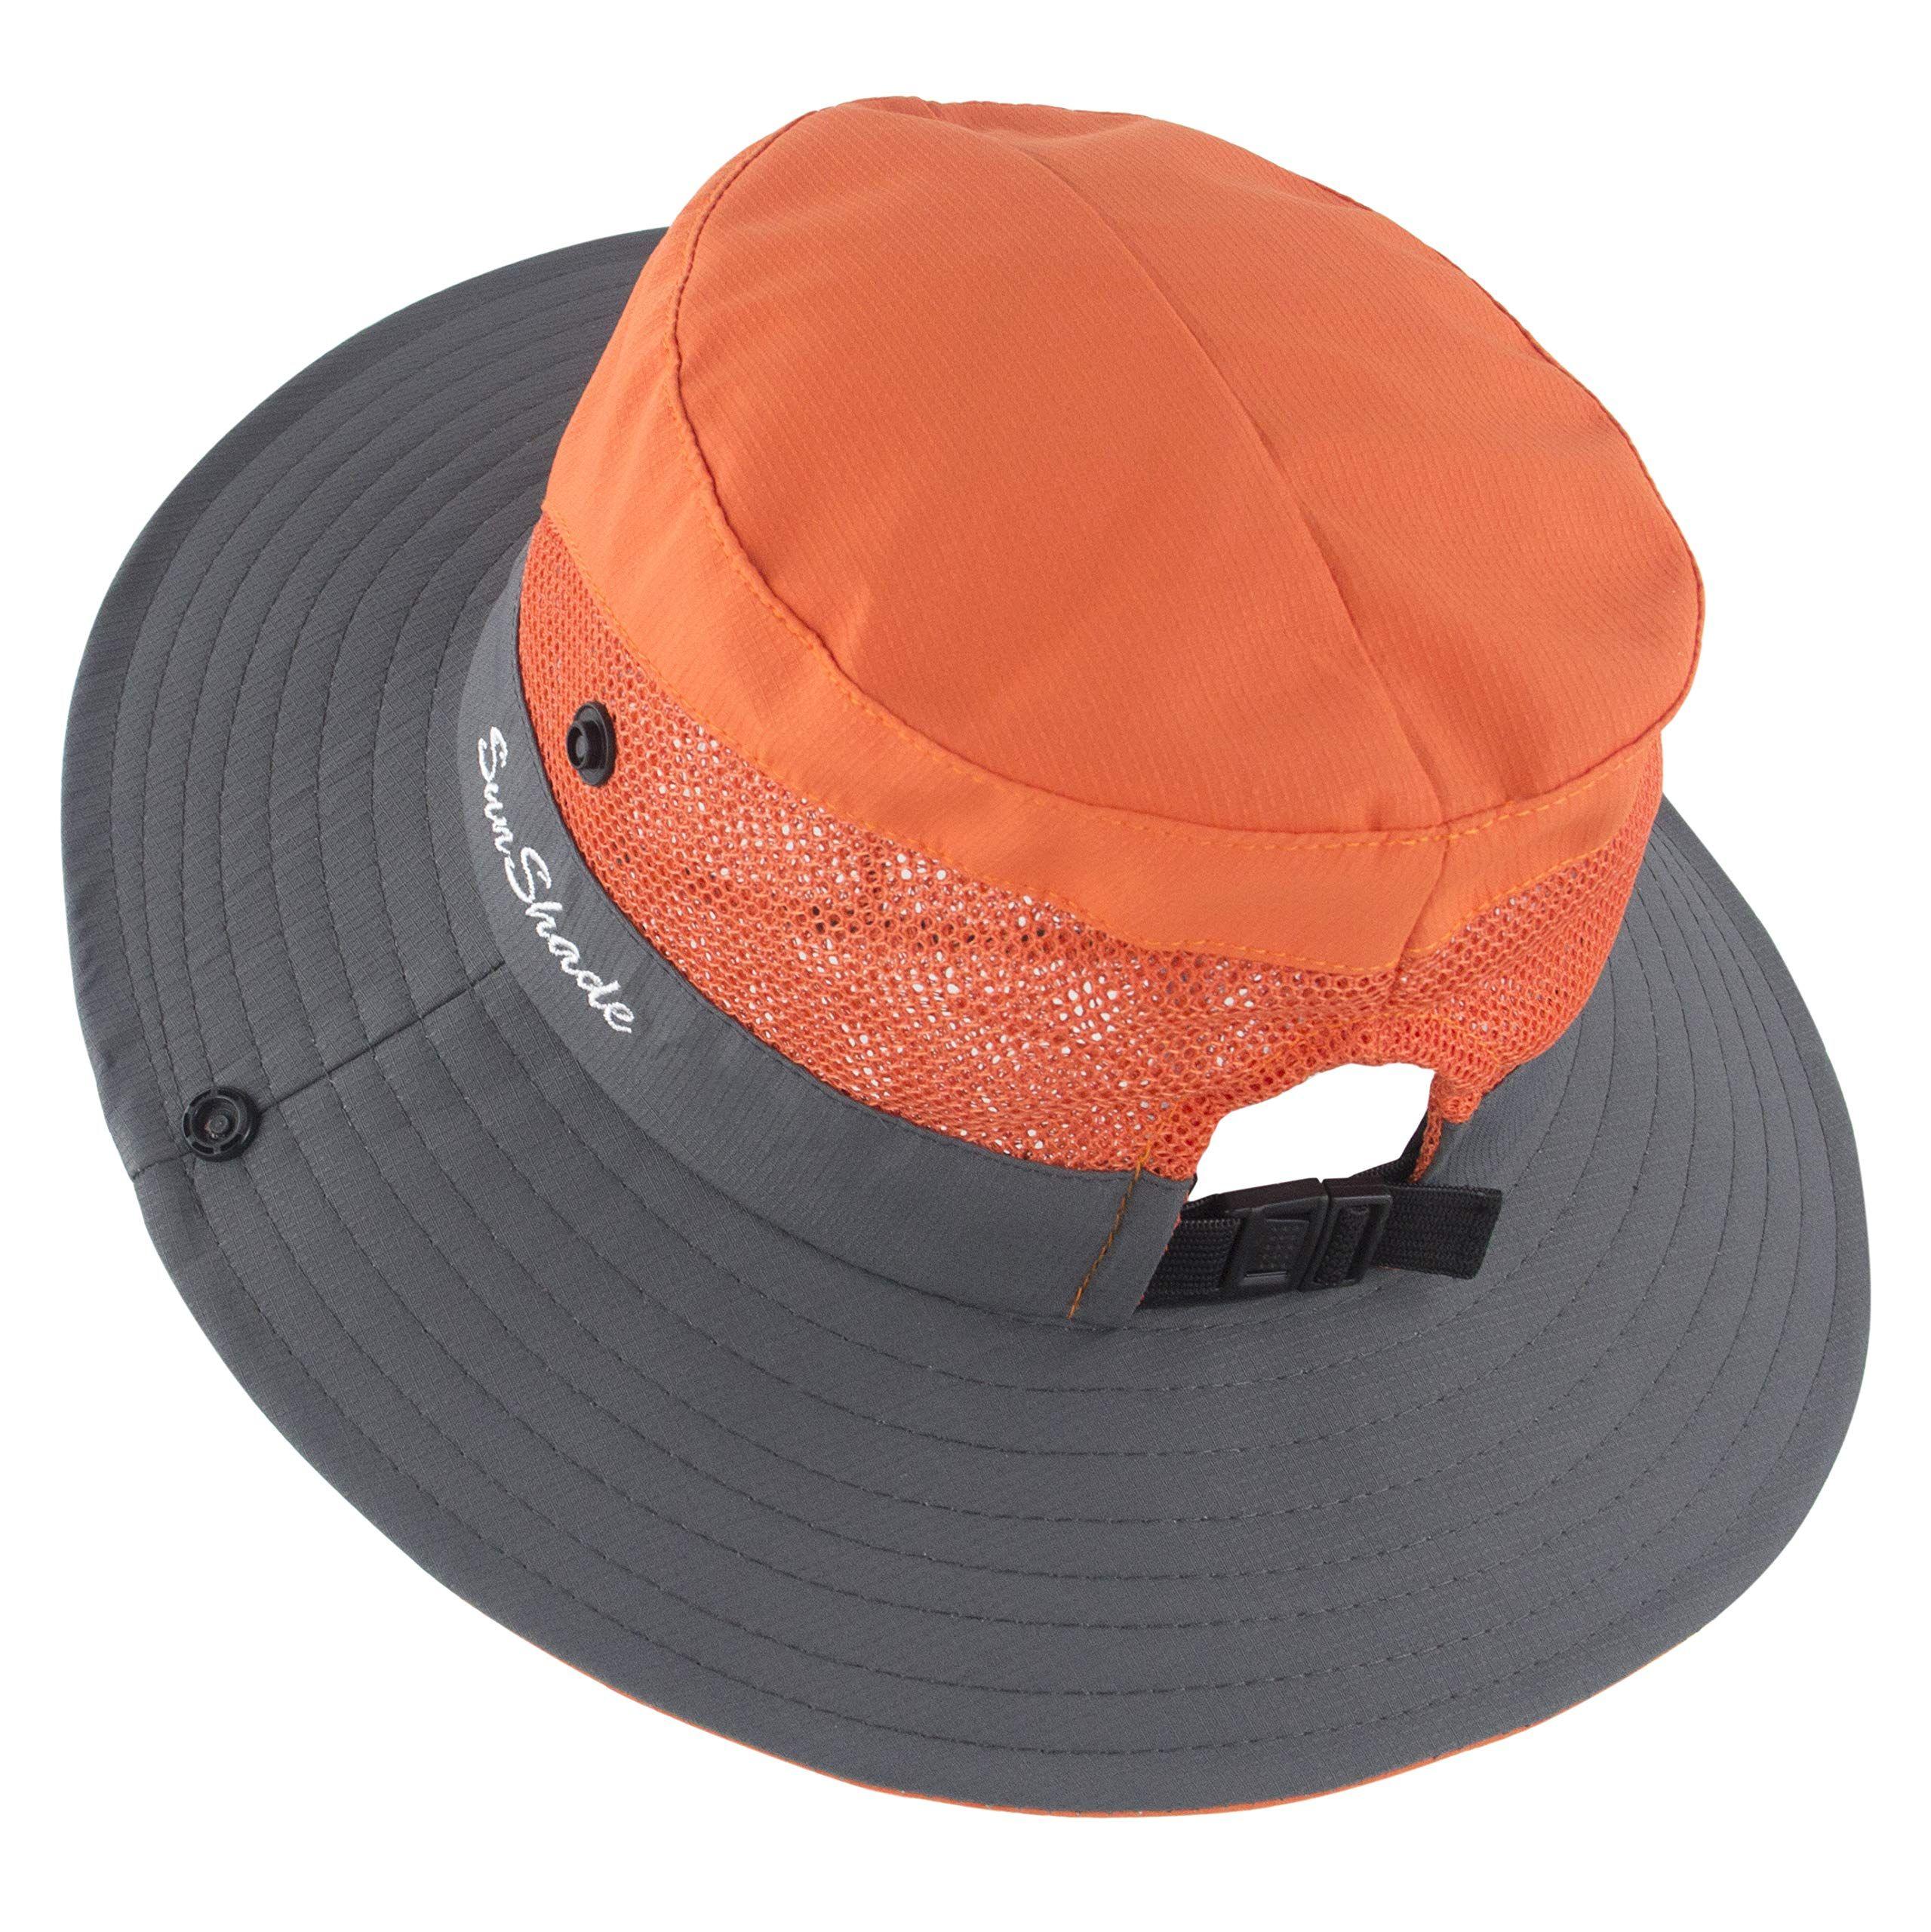 881e2dc2eb02f MEN SUMMER SUNSCREEN HATS UPF 50+ HAT SUN SHADING ANTI ULTRAVIOLET RAY  BEACH HAT FISHING HAT QUICK DRYING CAP